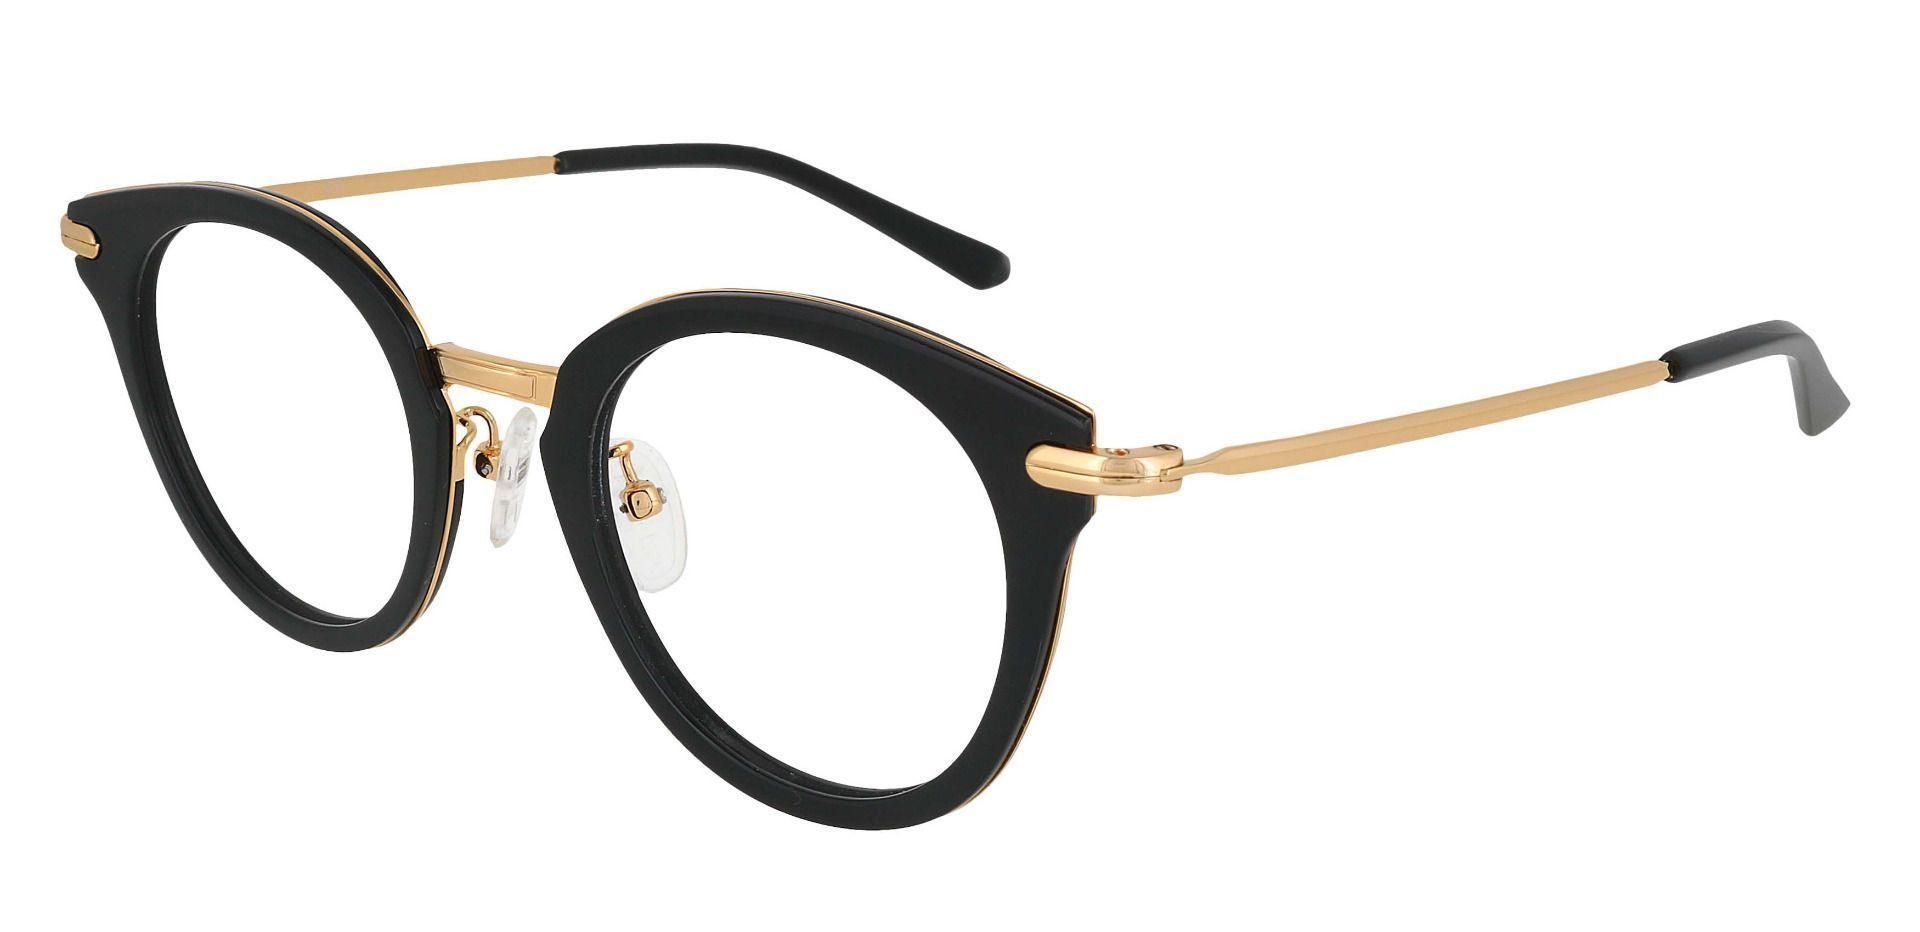 Seneca Round Prescription Glasses - Black